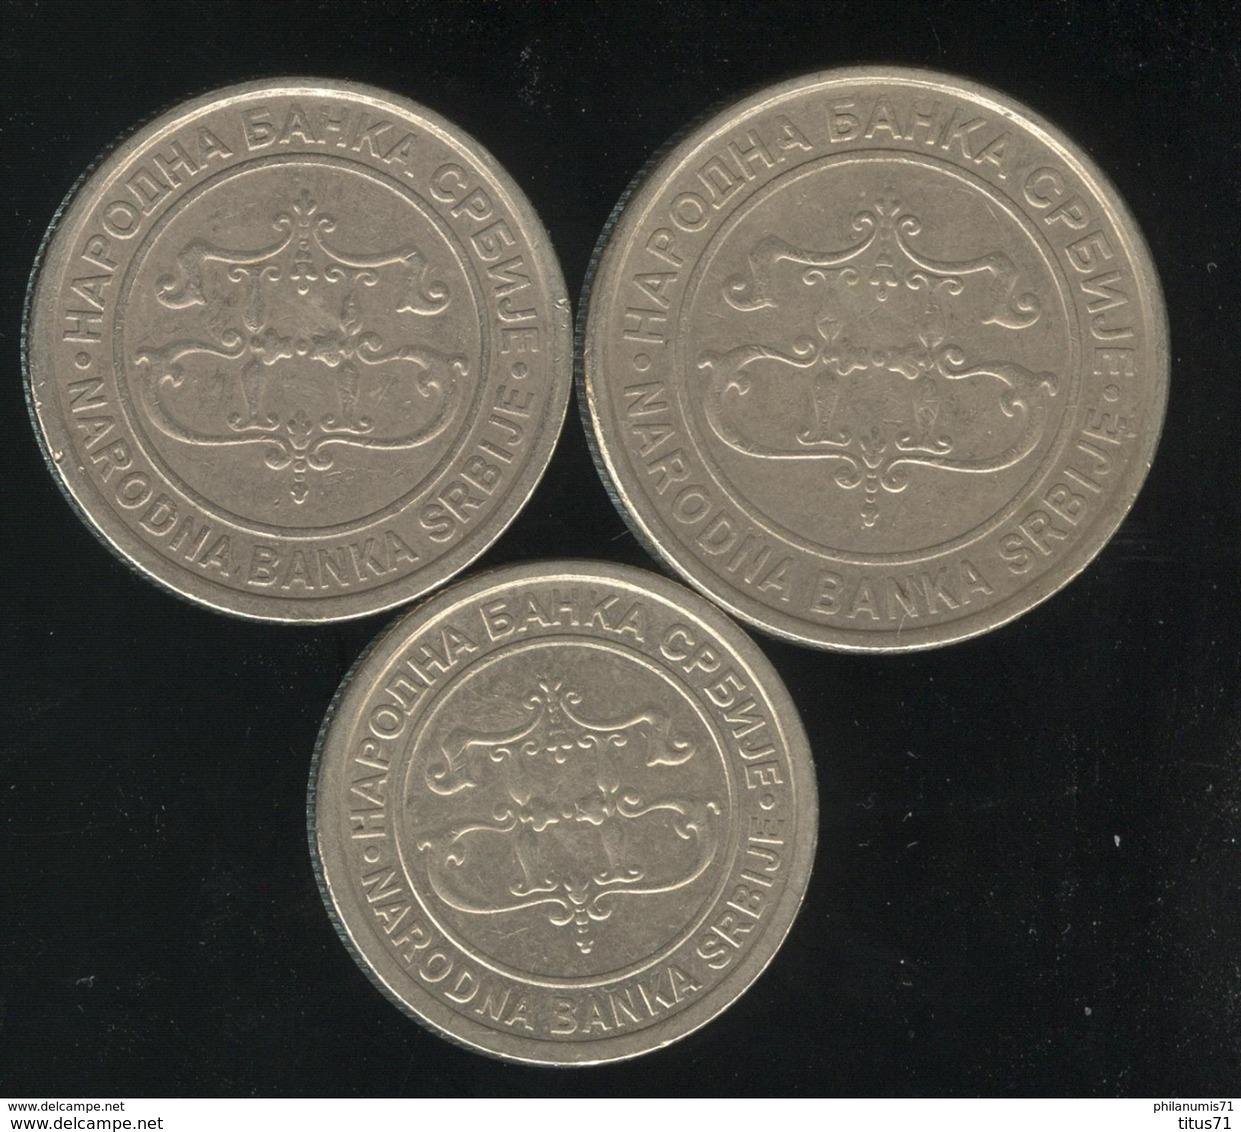 Lot Serbie / Serbia - 5 , 10 , 20 Dinar 2003 - Serbie